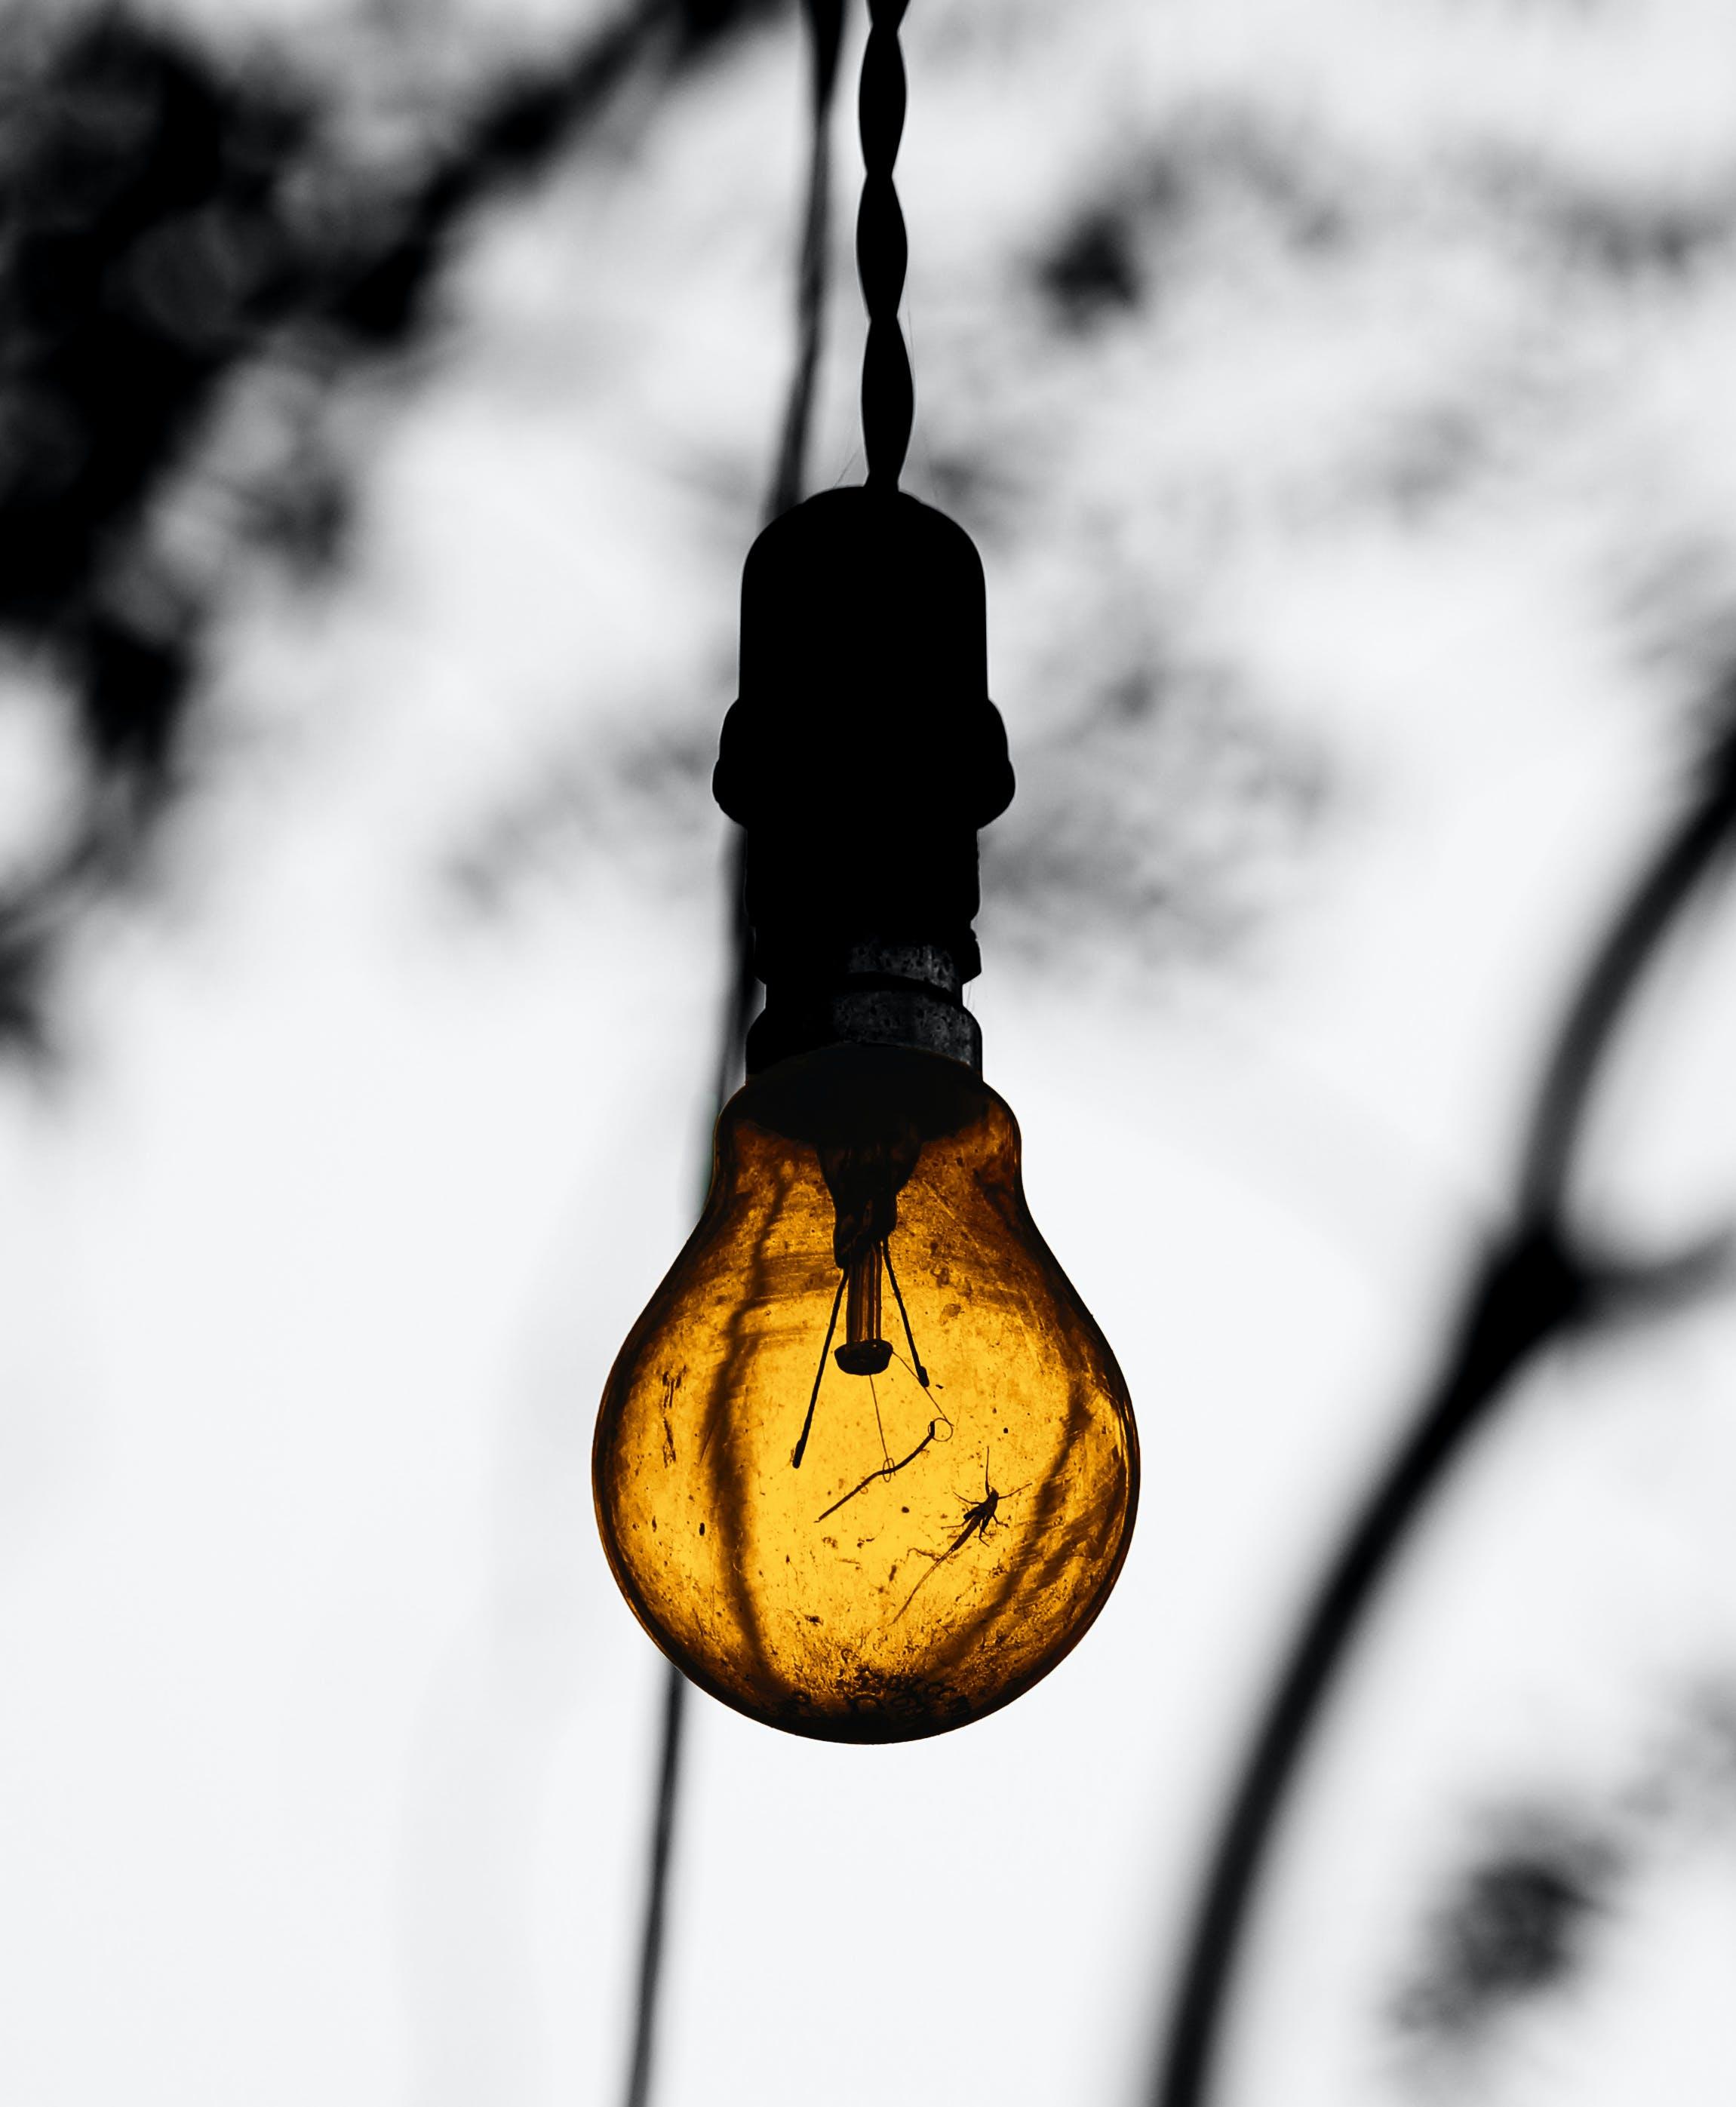 Close-Up Photography of Lightbulb